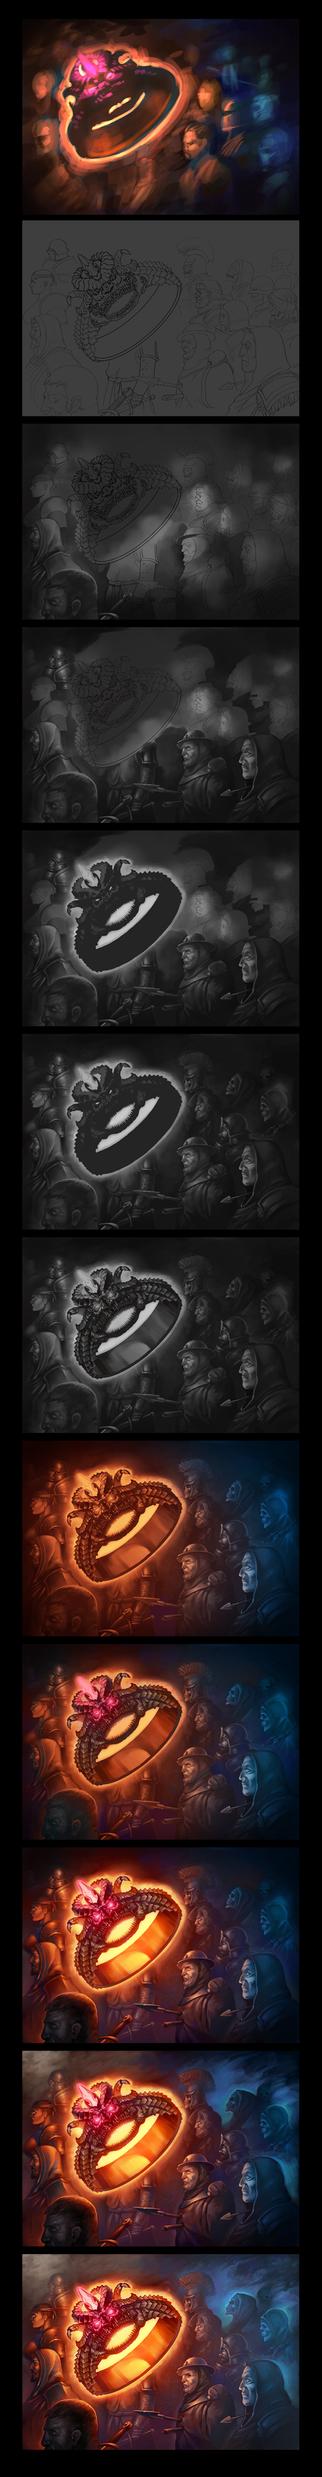 Ring of 1000 soul wip by Gimaldinov